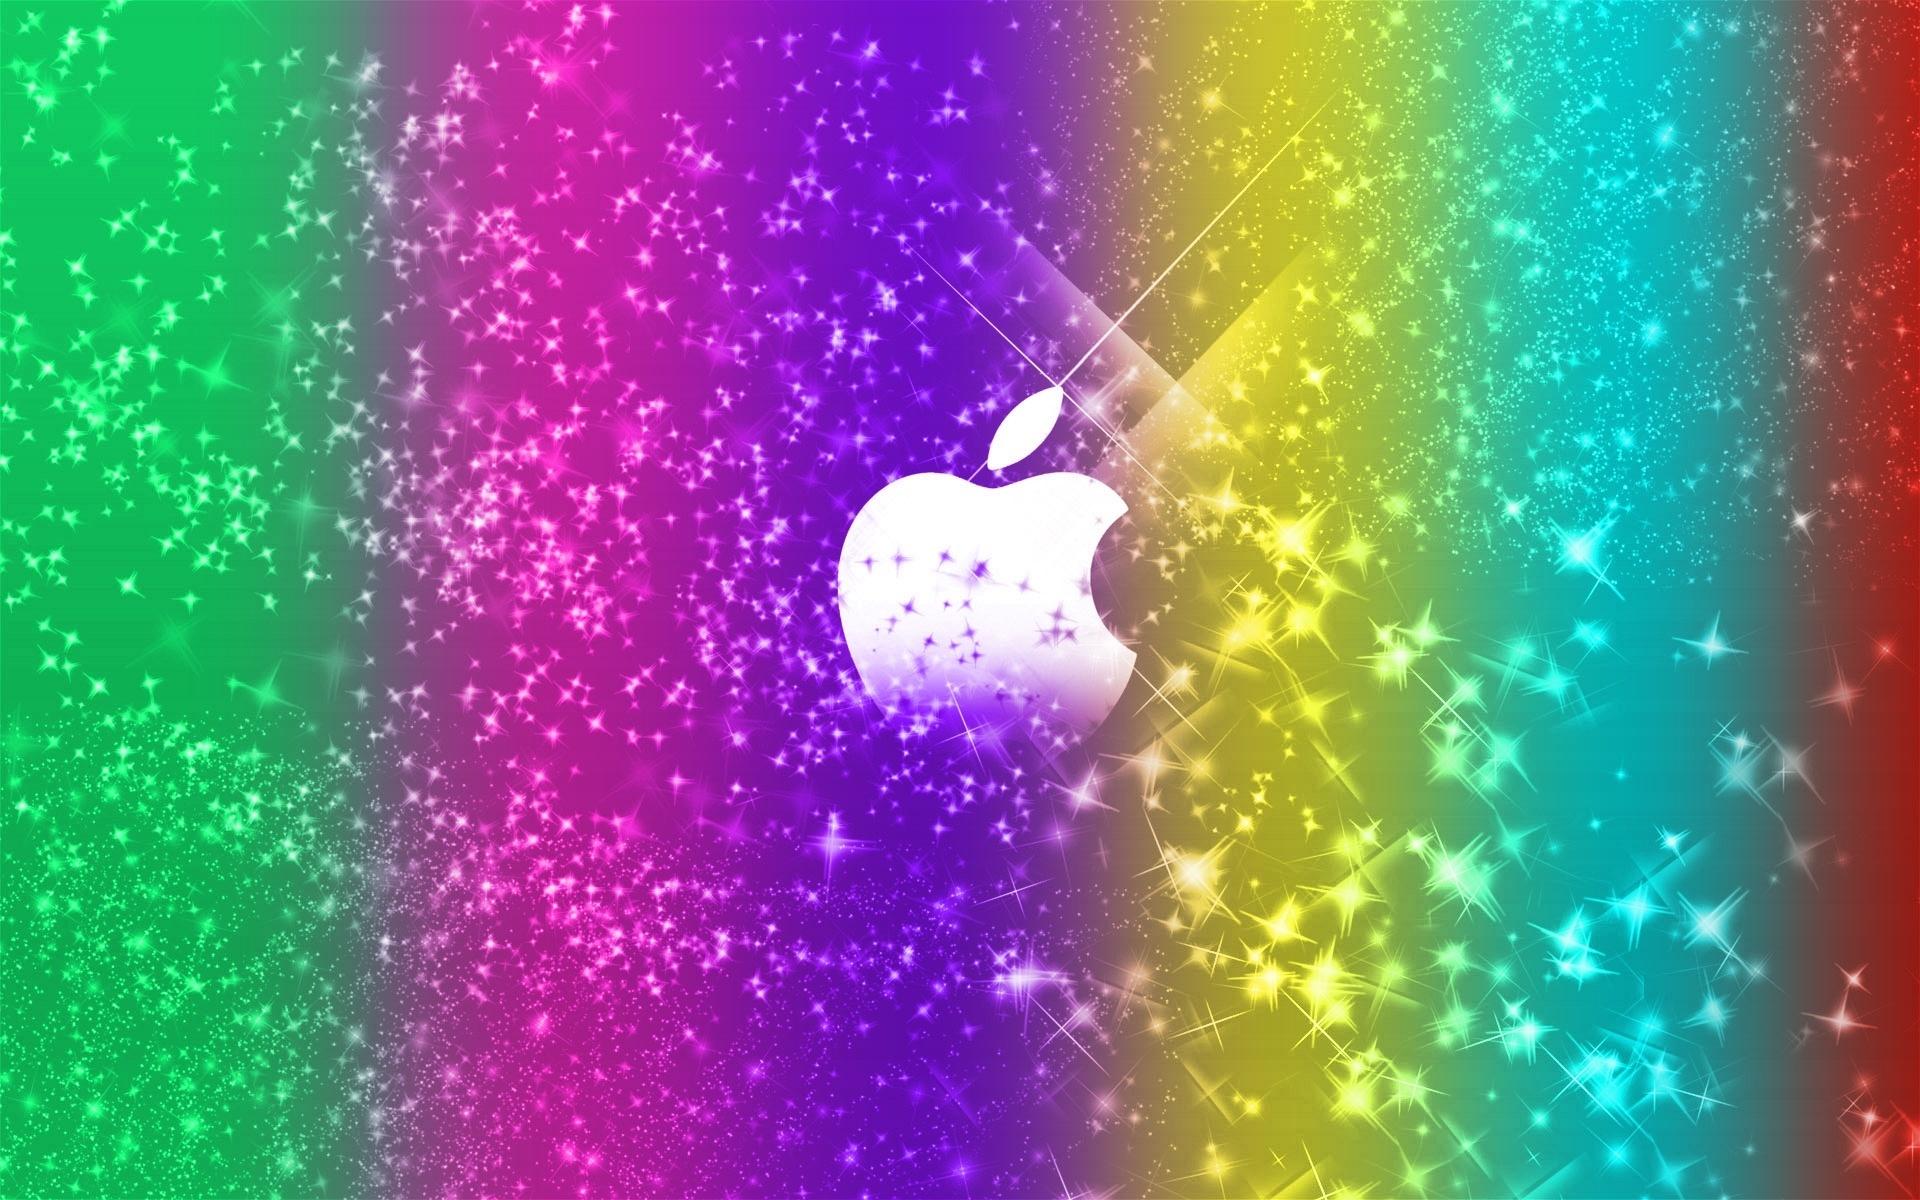 Apple HD Wallpaper Background Image 1920x1200 ID392235 1920x1200